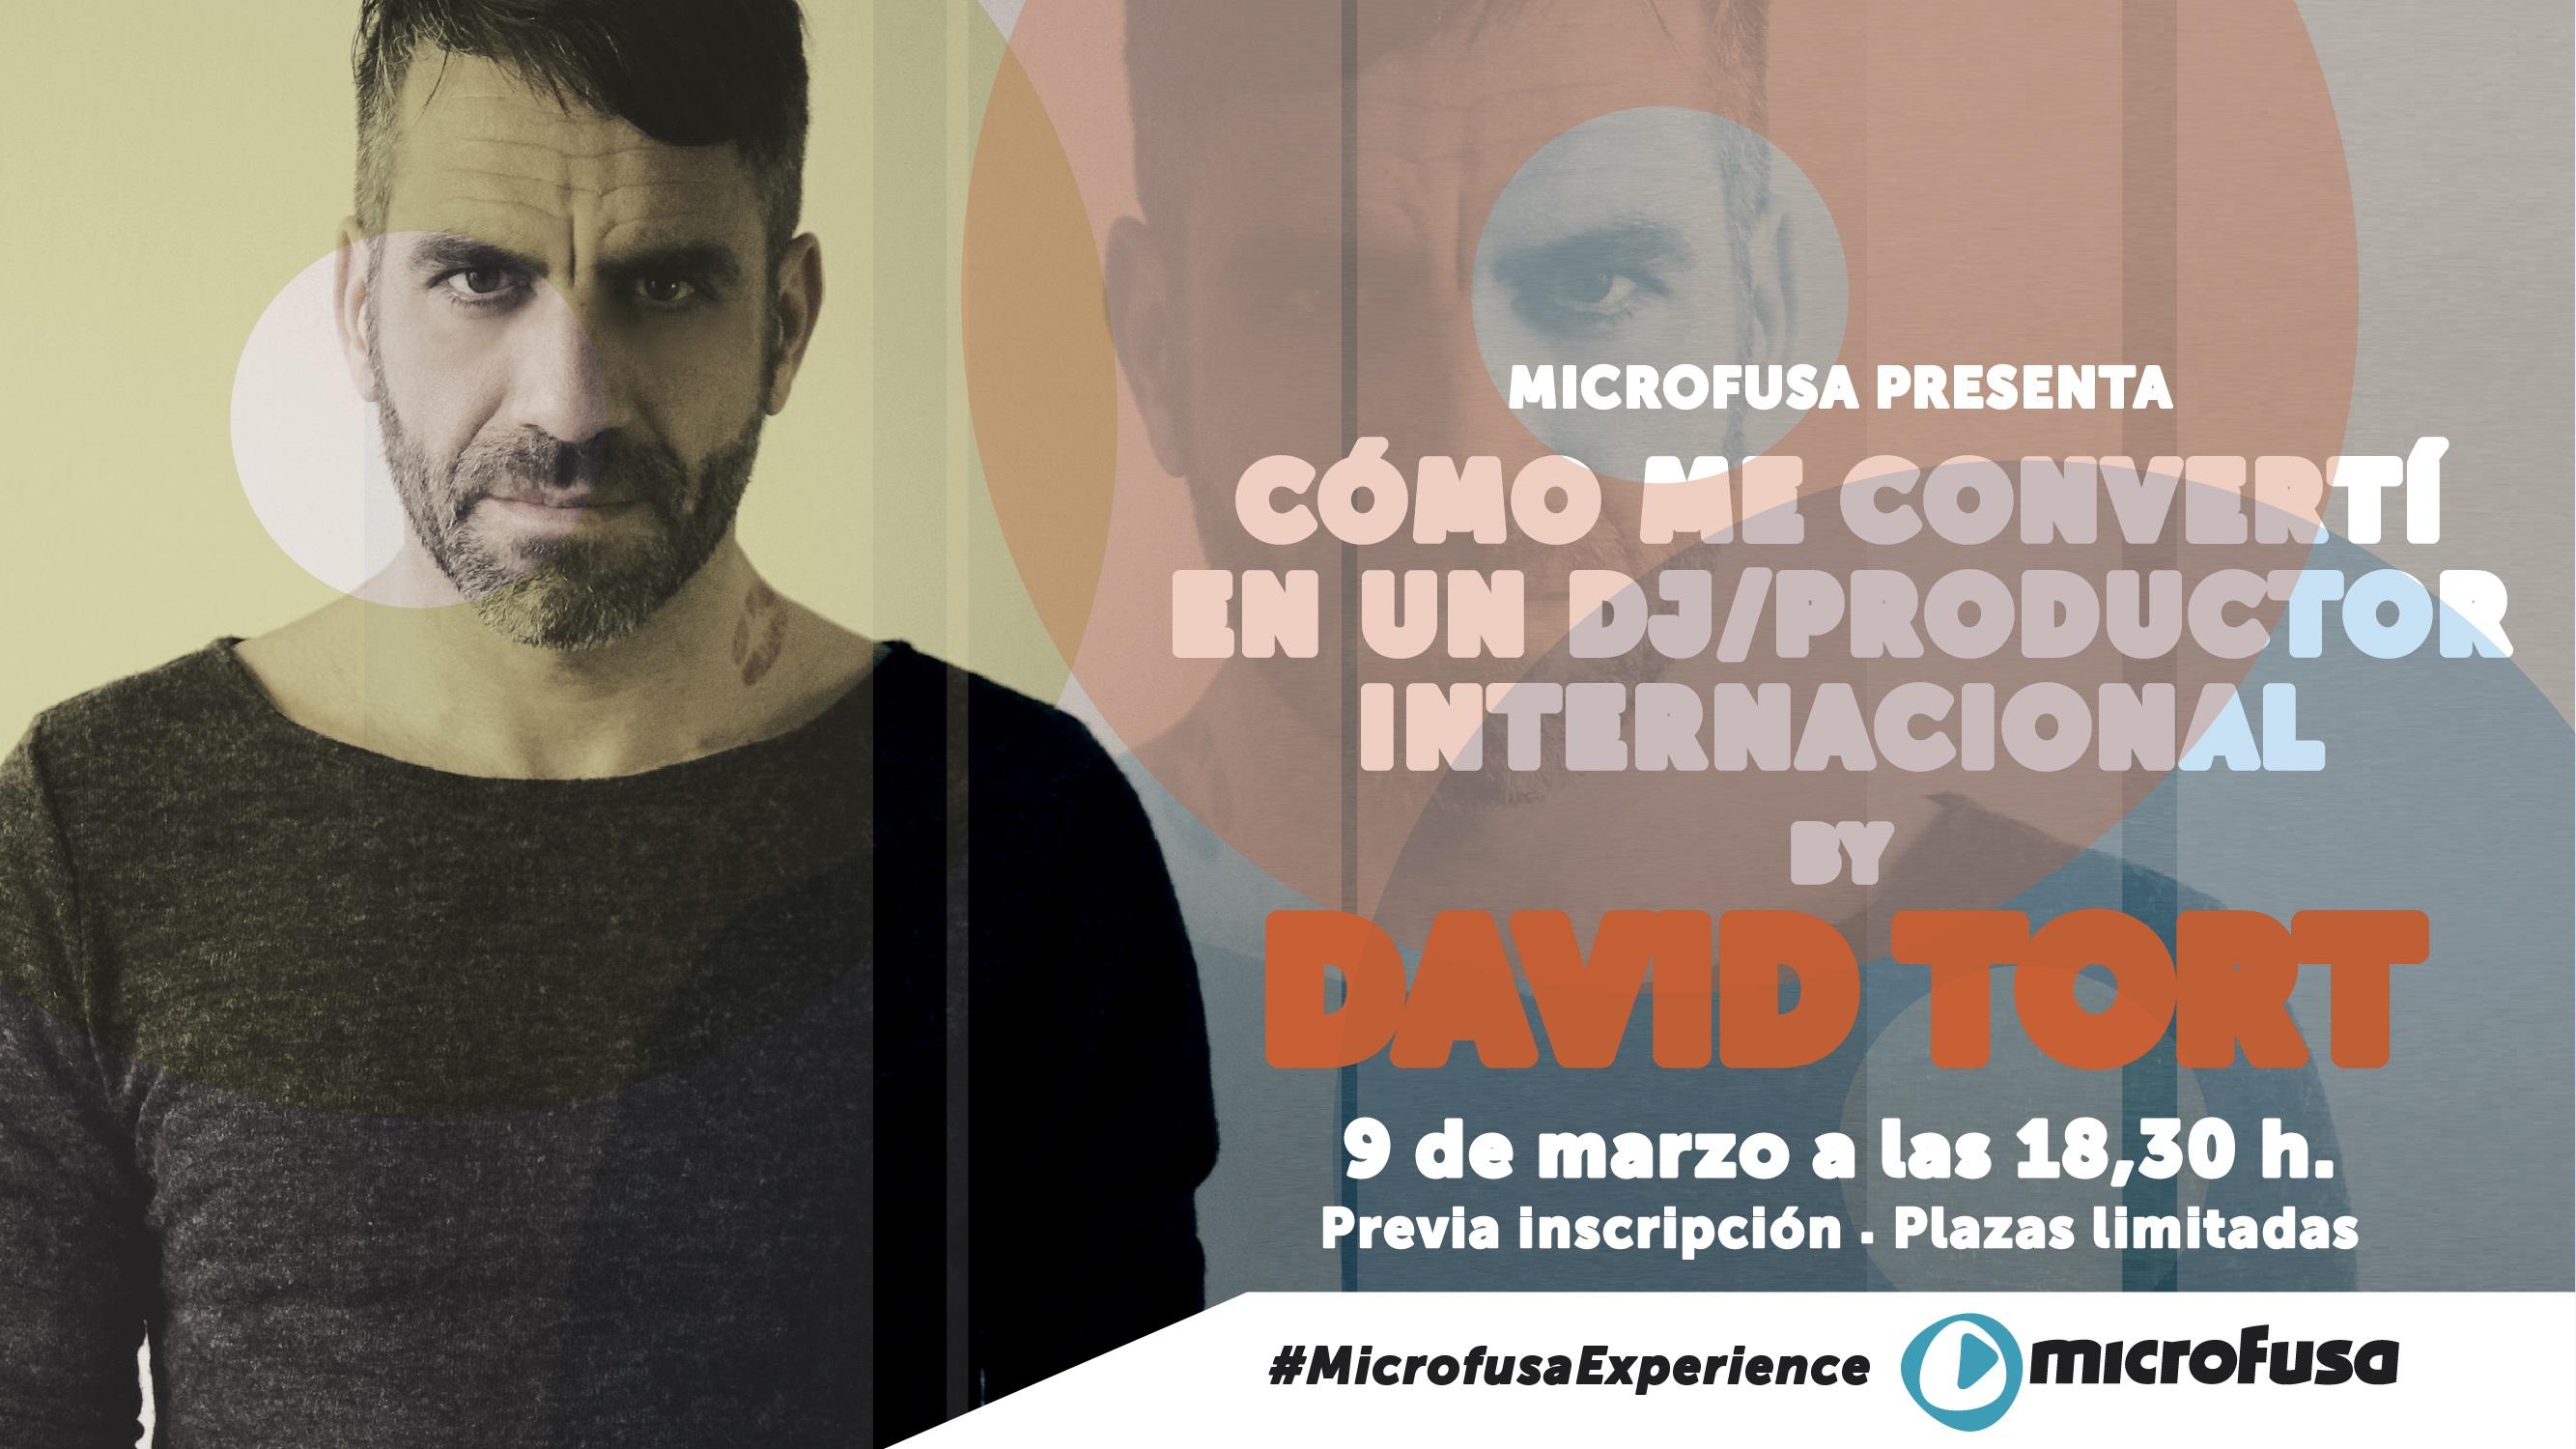 "Productor Internacional"" by David Tort"